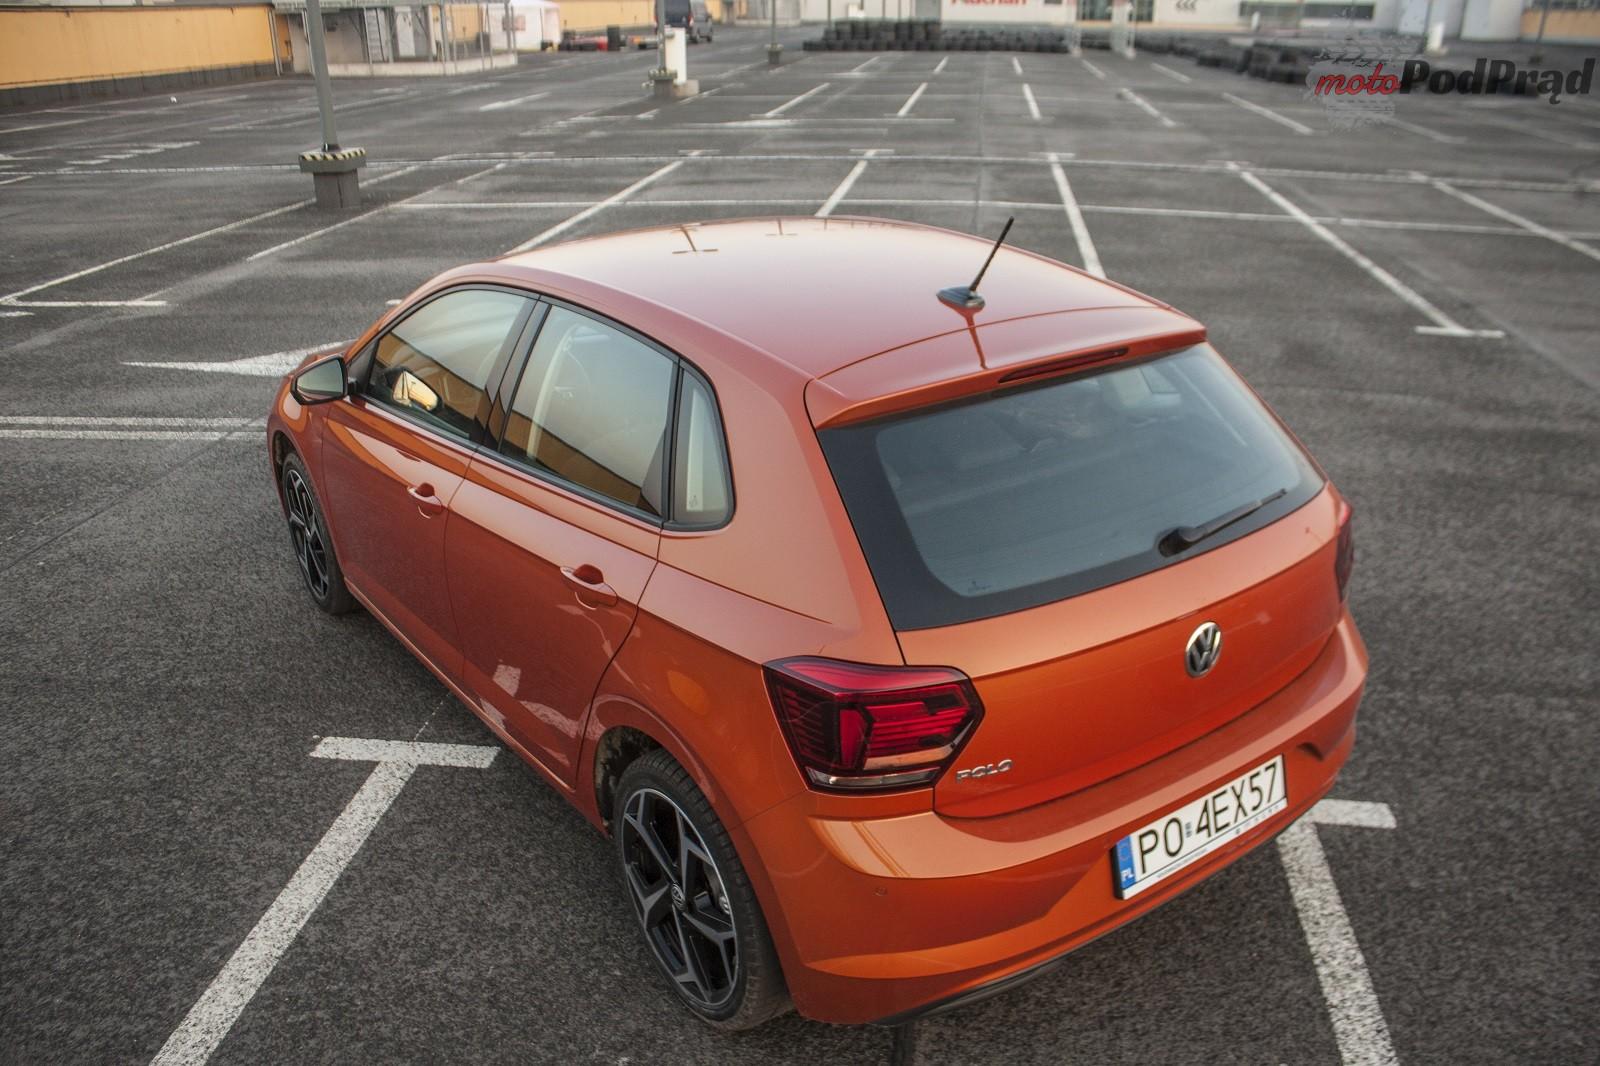 polo34 Test: Volkswagen Polo 1.0 TSI   lubię pomarańcze